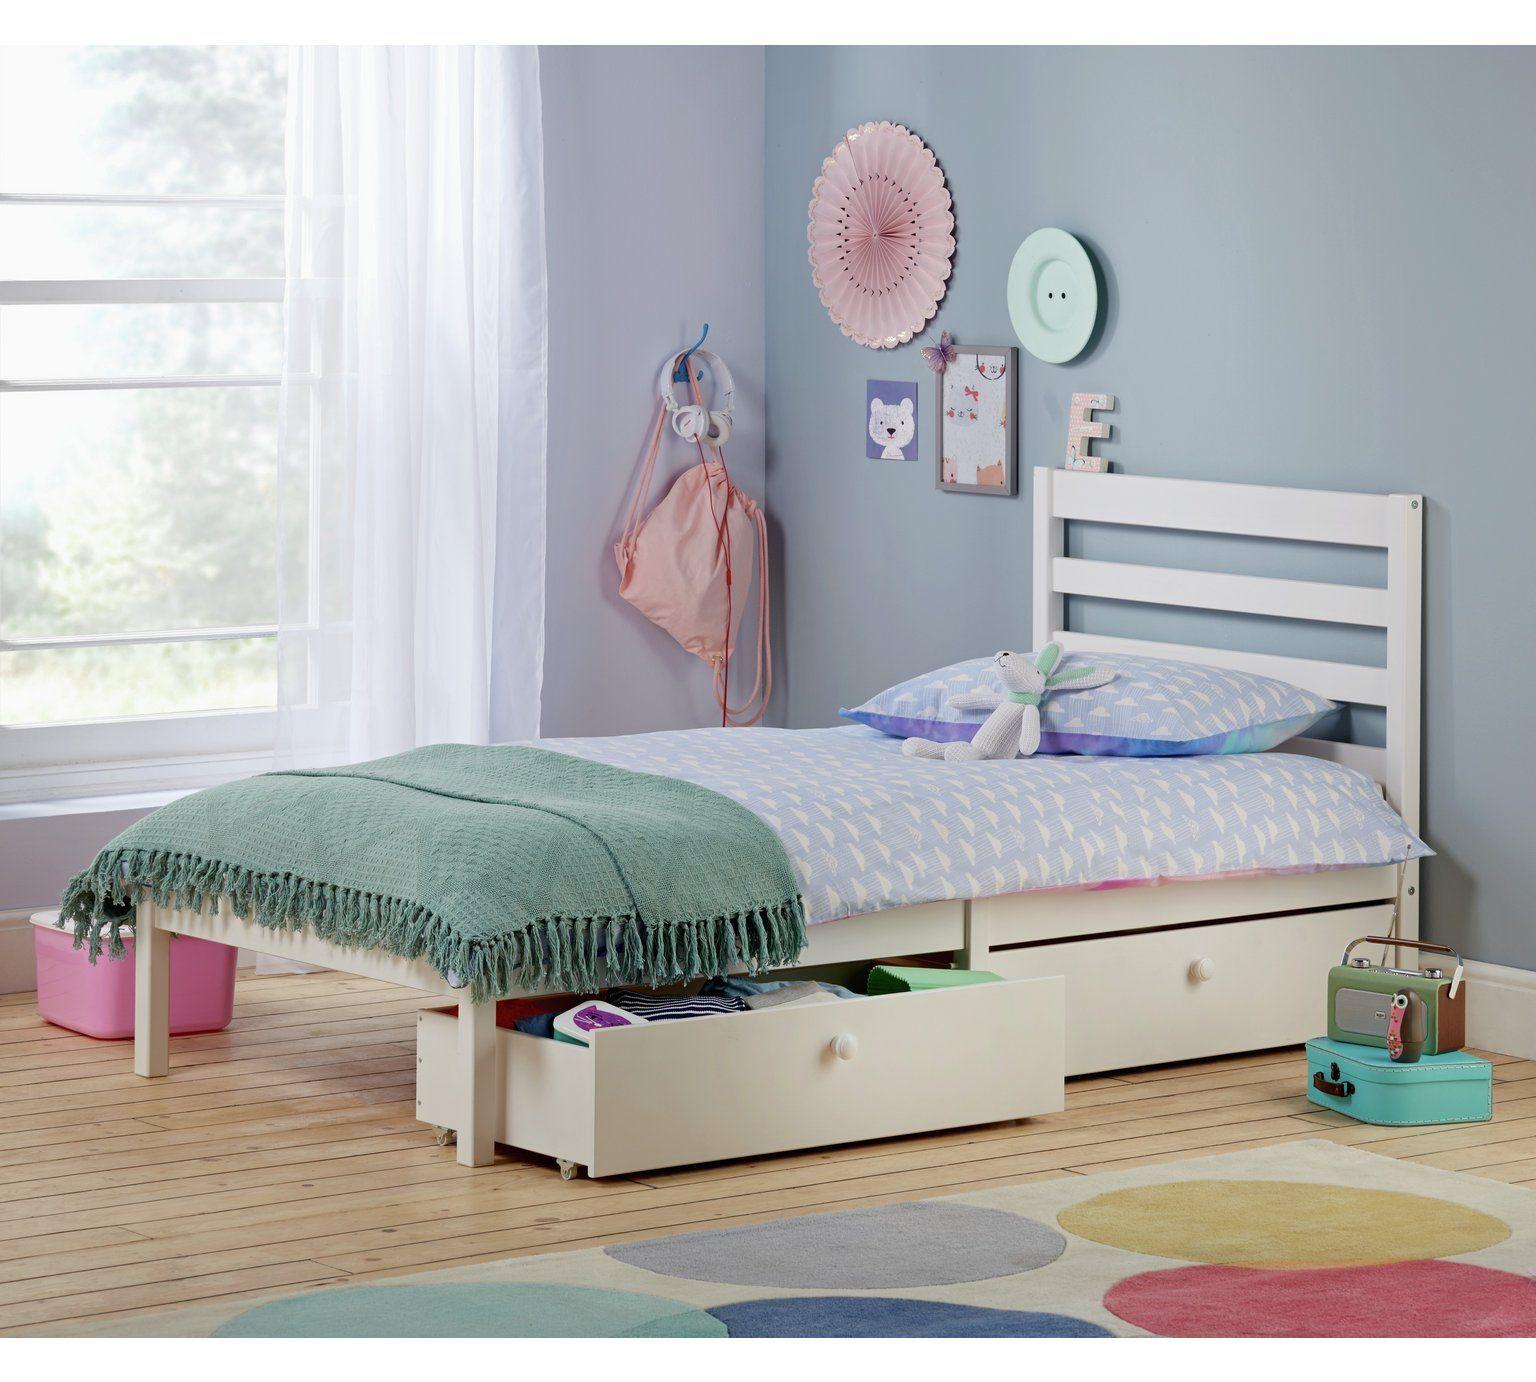 Home Kaycie White Single Bed Frame White Single Bed Frame Kid Beds Bed Frame